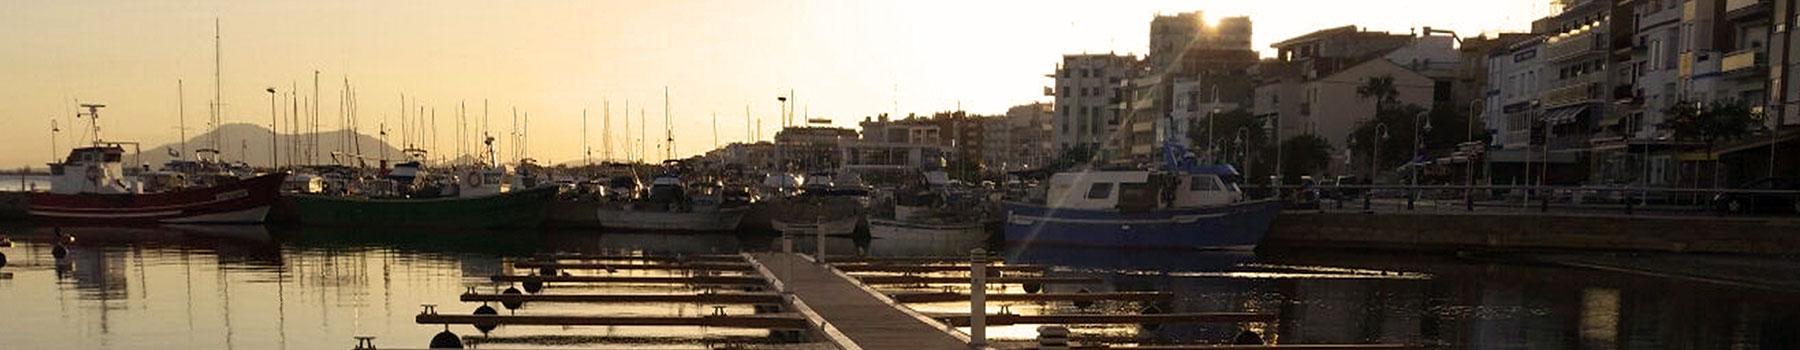 Discover l'Ampolla, gateway to the Delta